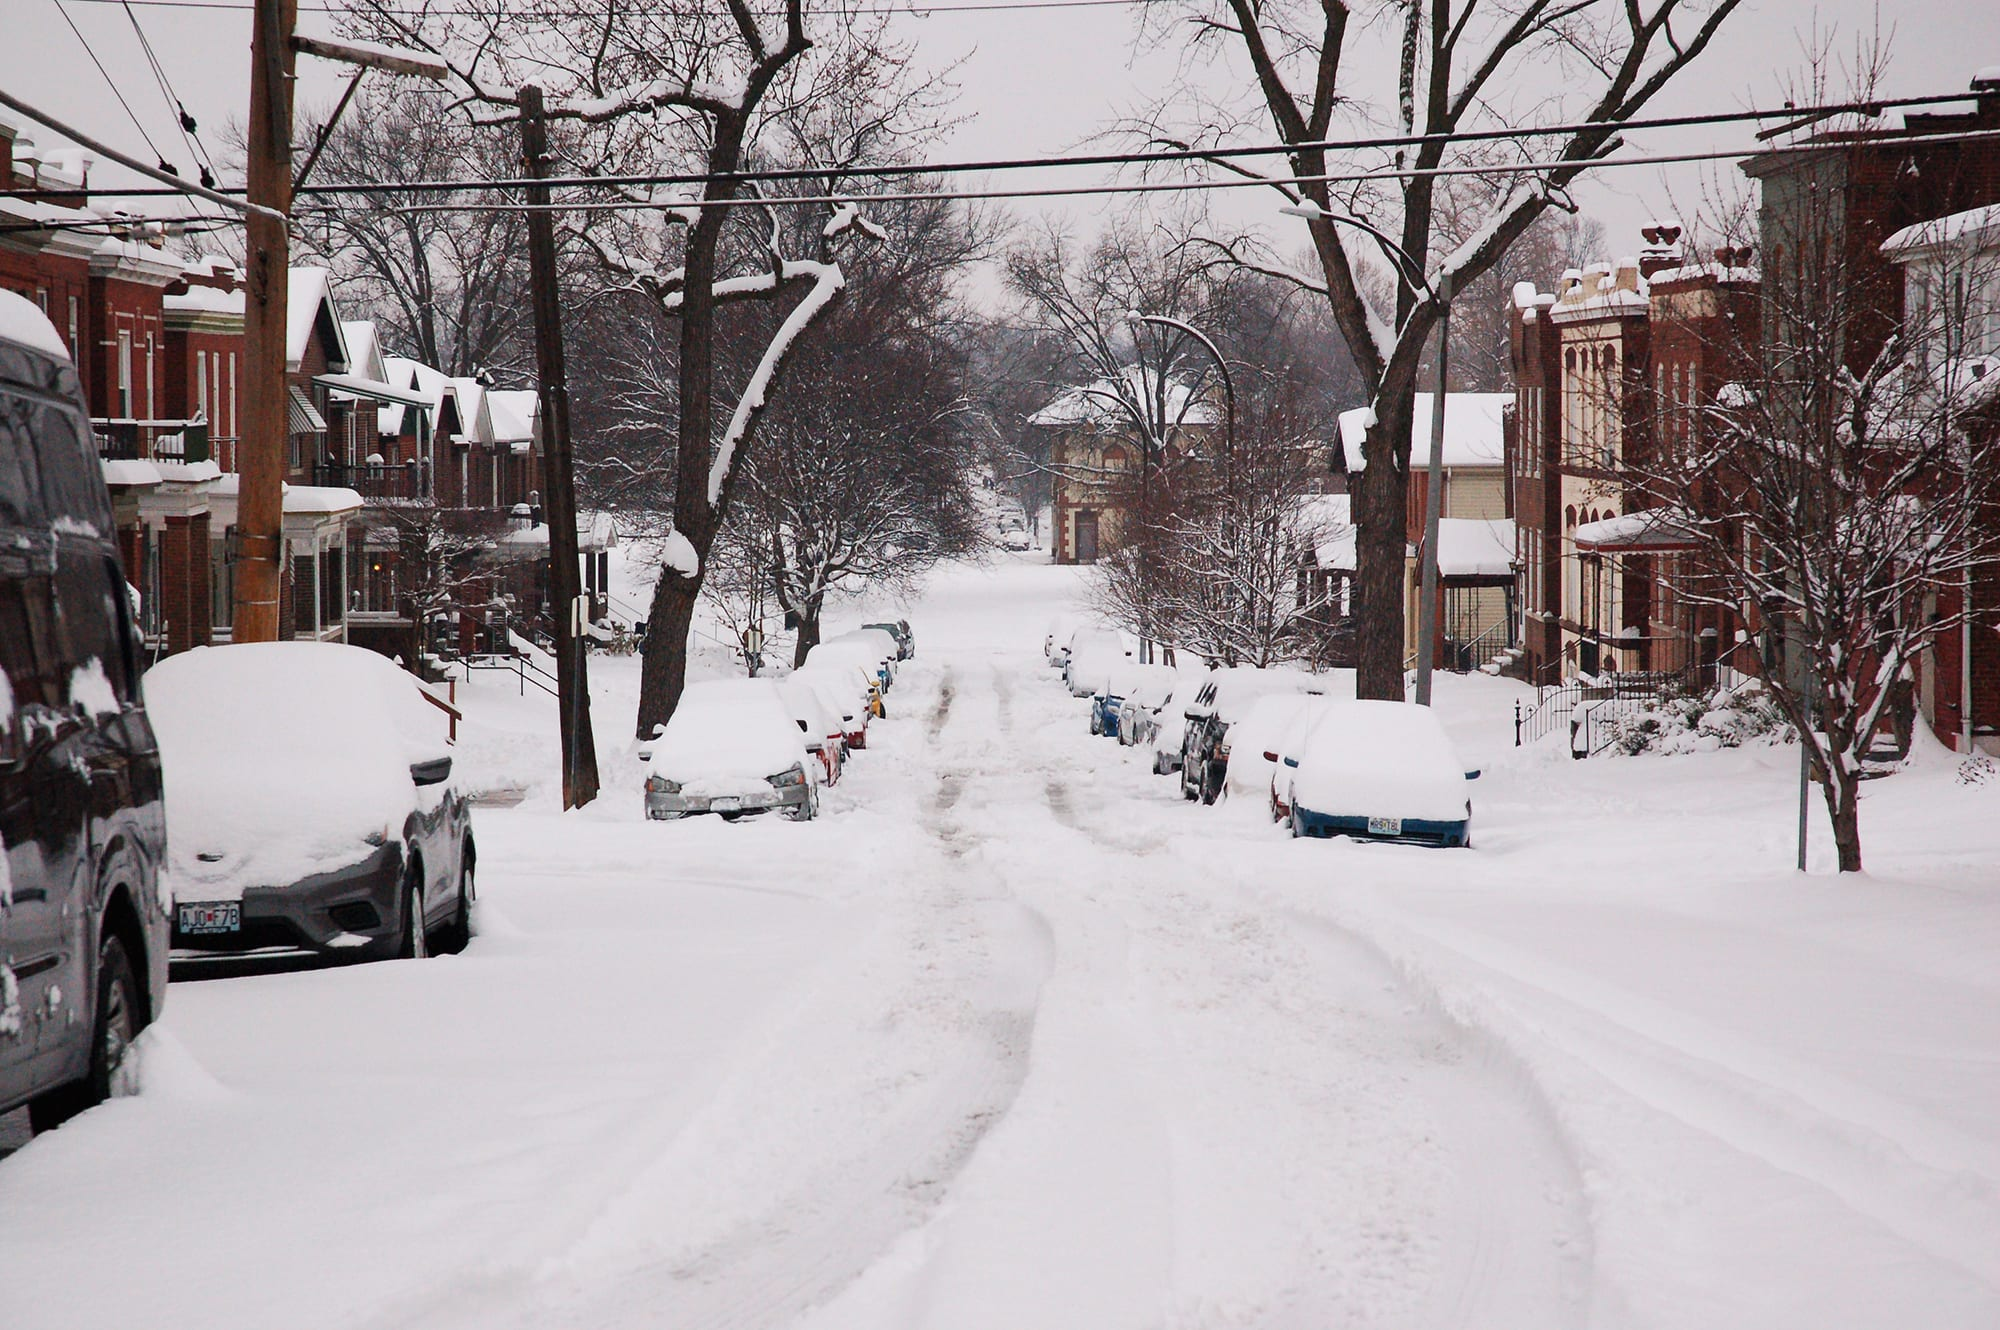 Virginia Avenue in the snow.